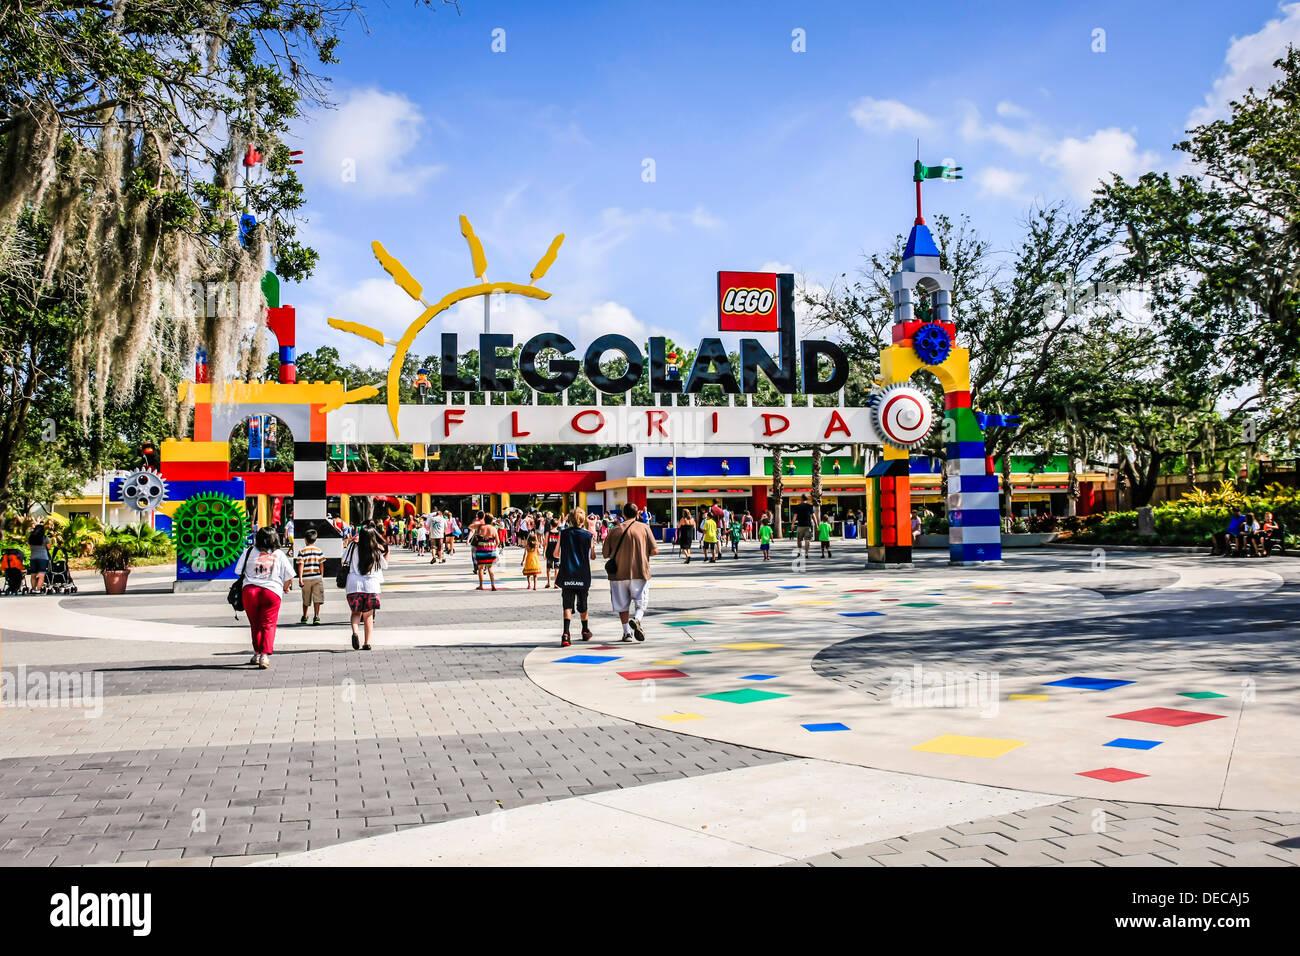 Entrance to Legoland Florida Stock Photo